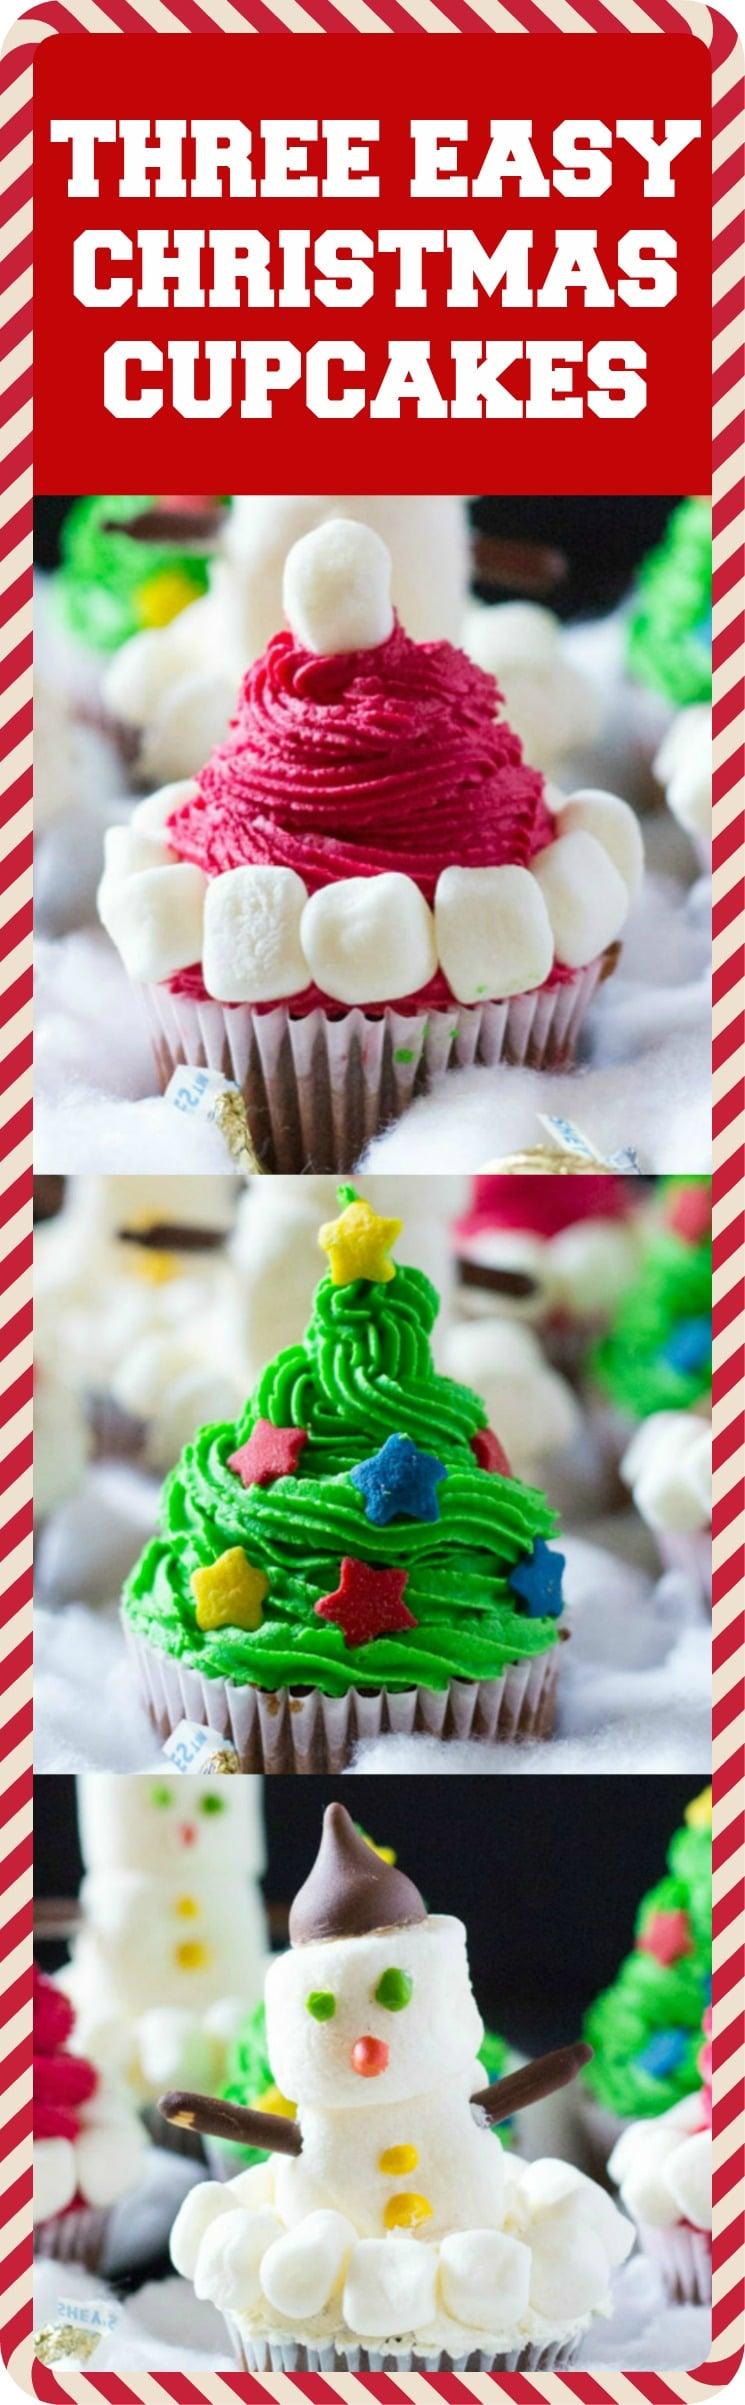 three-easy-christmas-cupcakes-long-pin